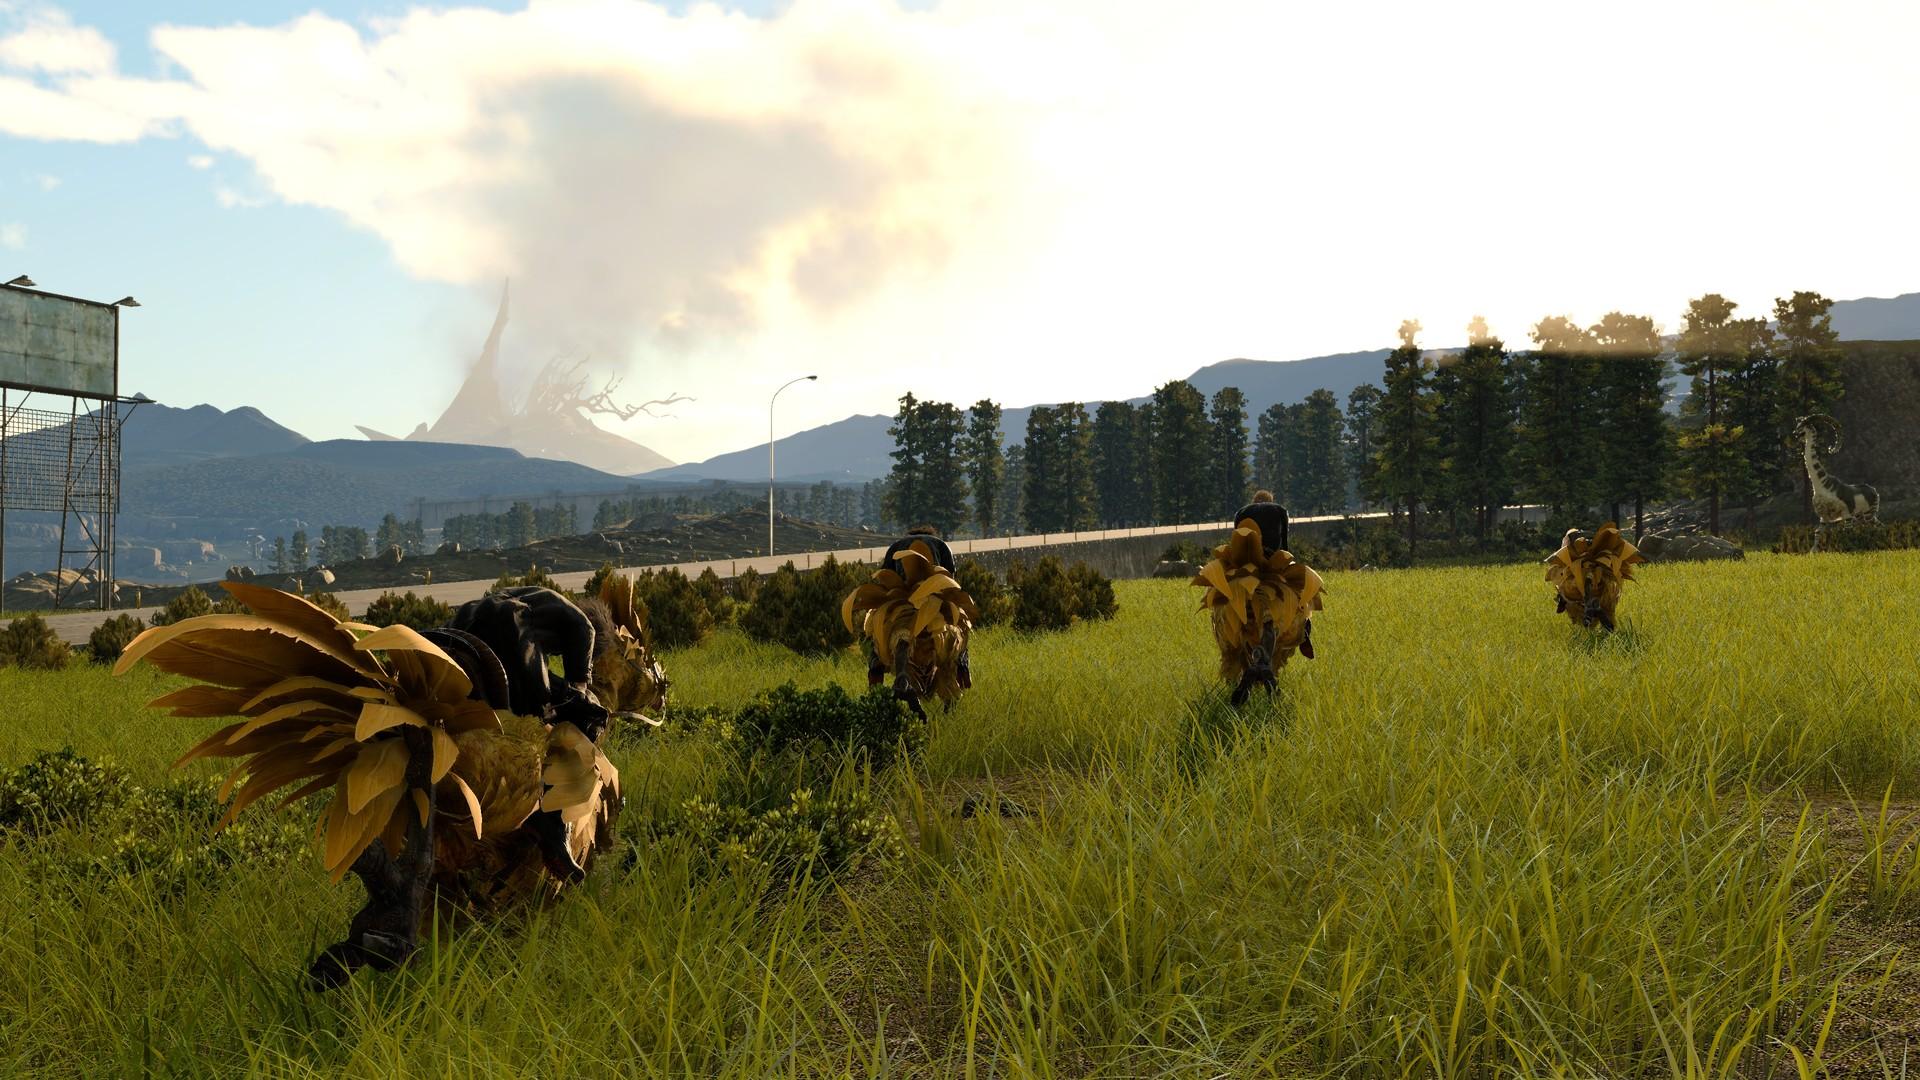 FINAL FANTASY XV WINDOWS EDITION for PC screenshot